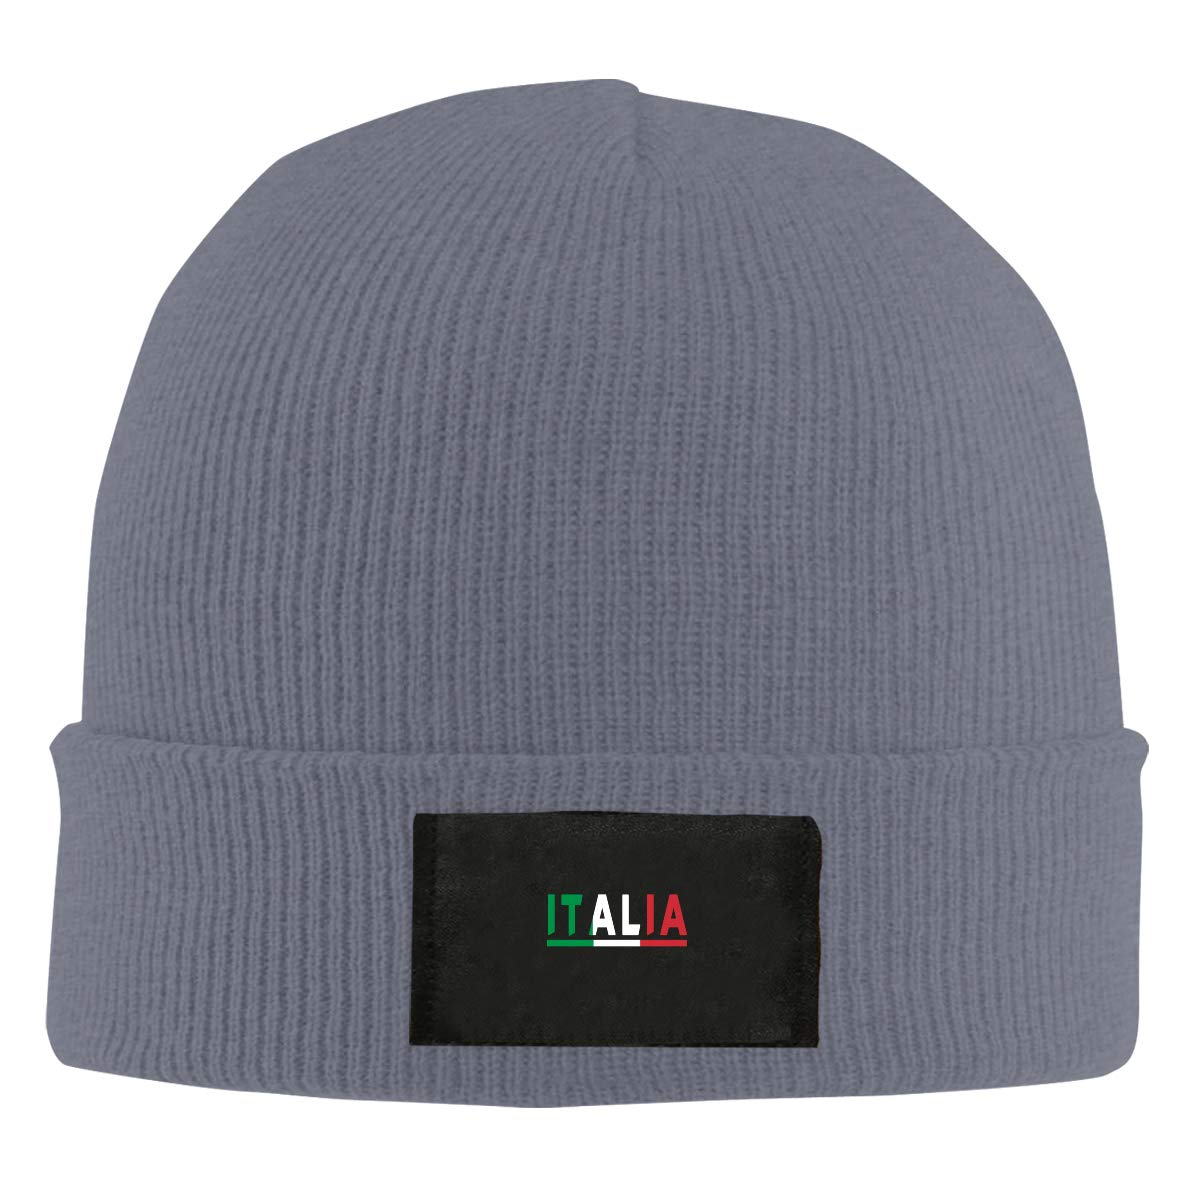 LRHUI Italian Flag Winter Knitted Hat Warm Wool Skull Beanie Cap